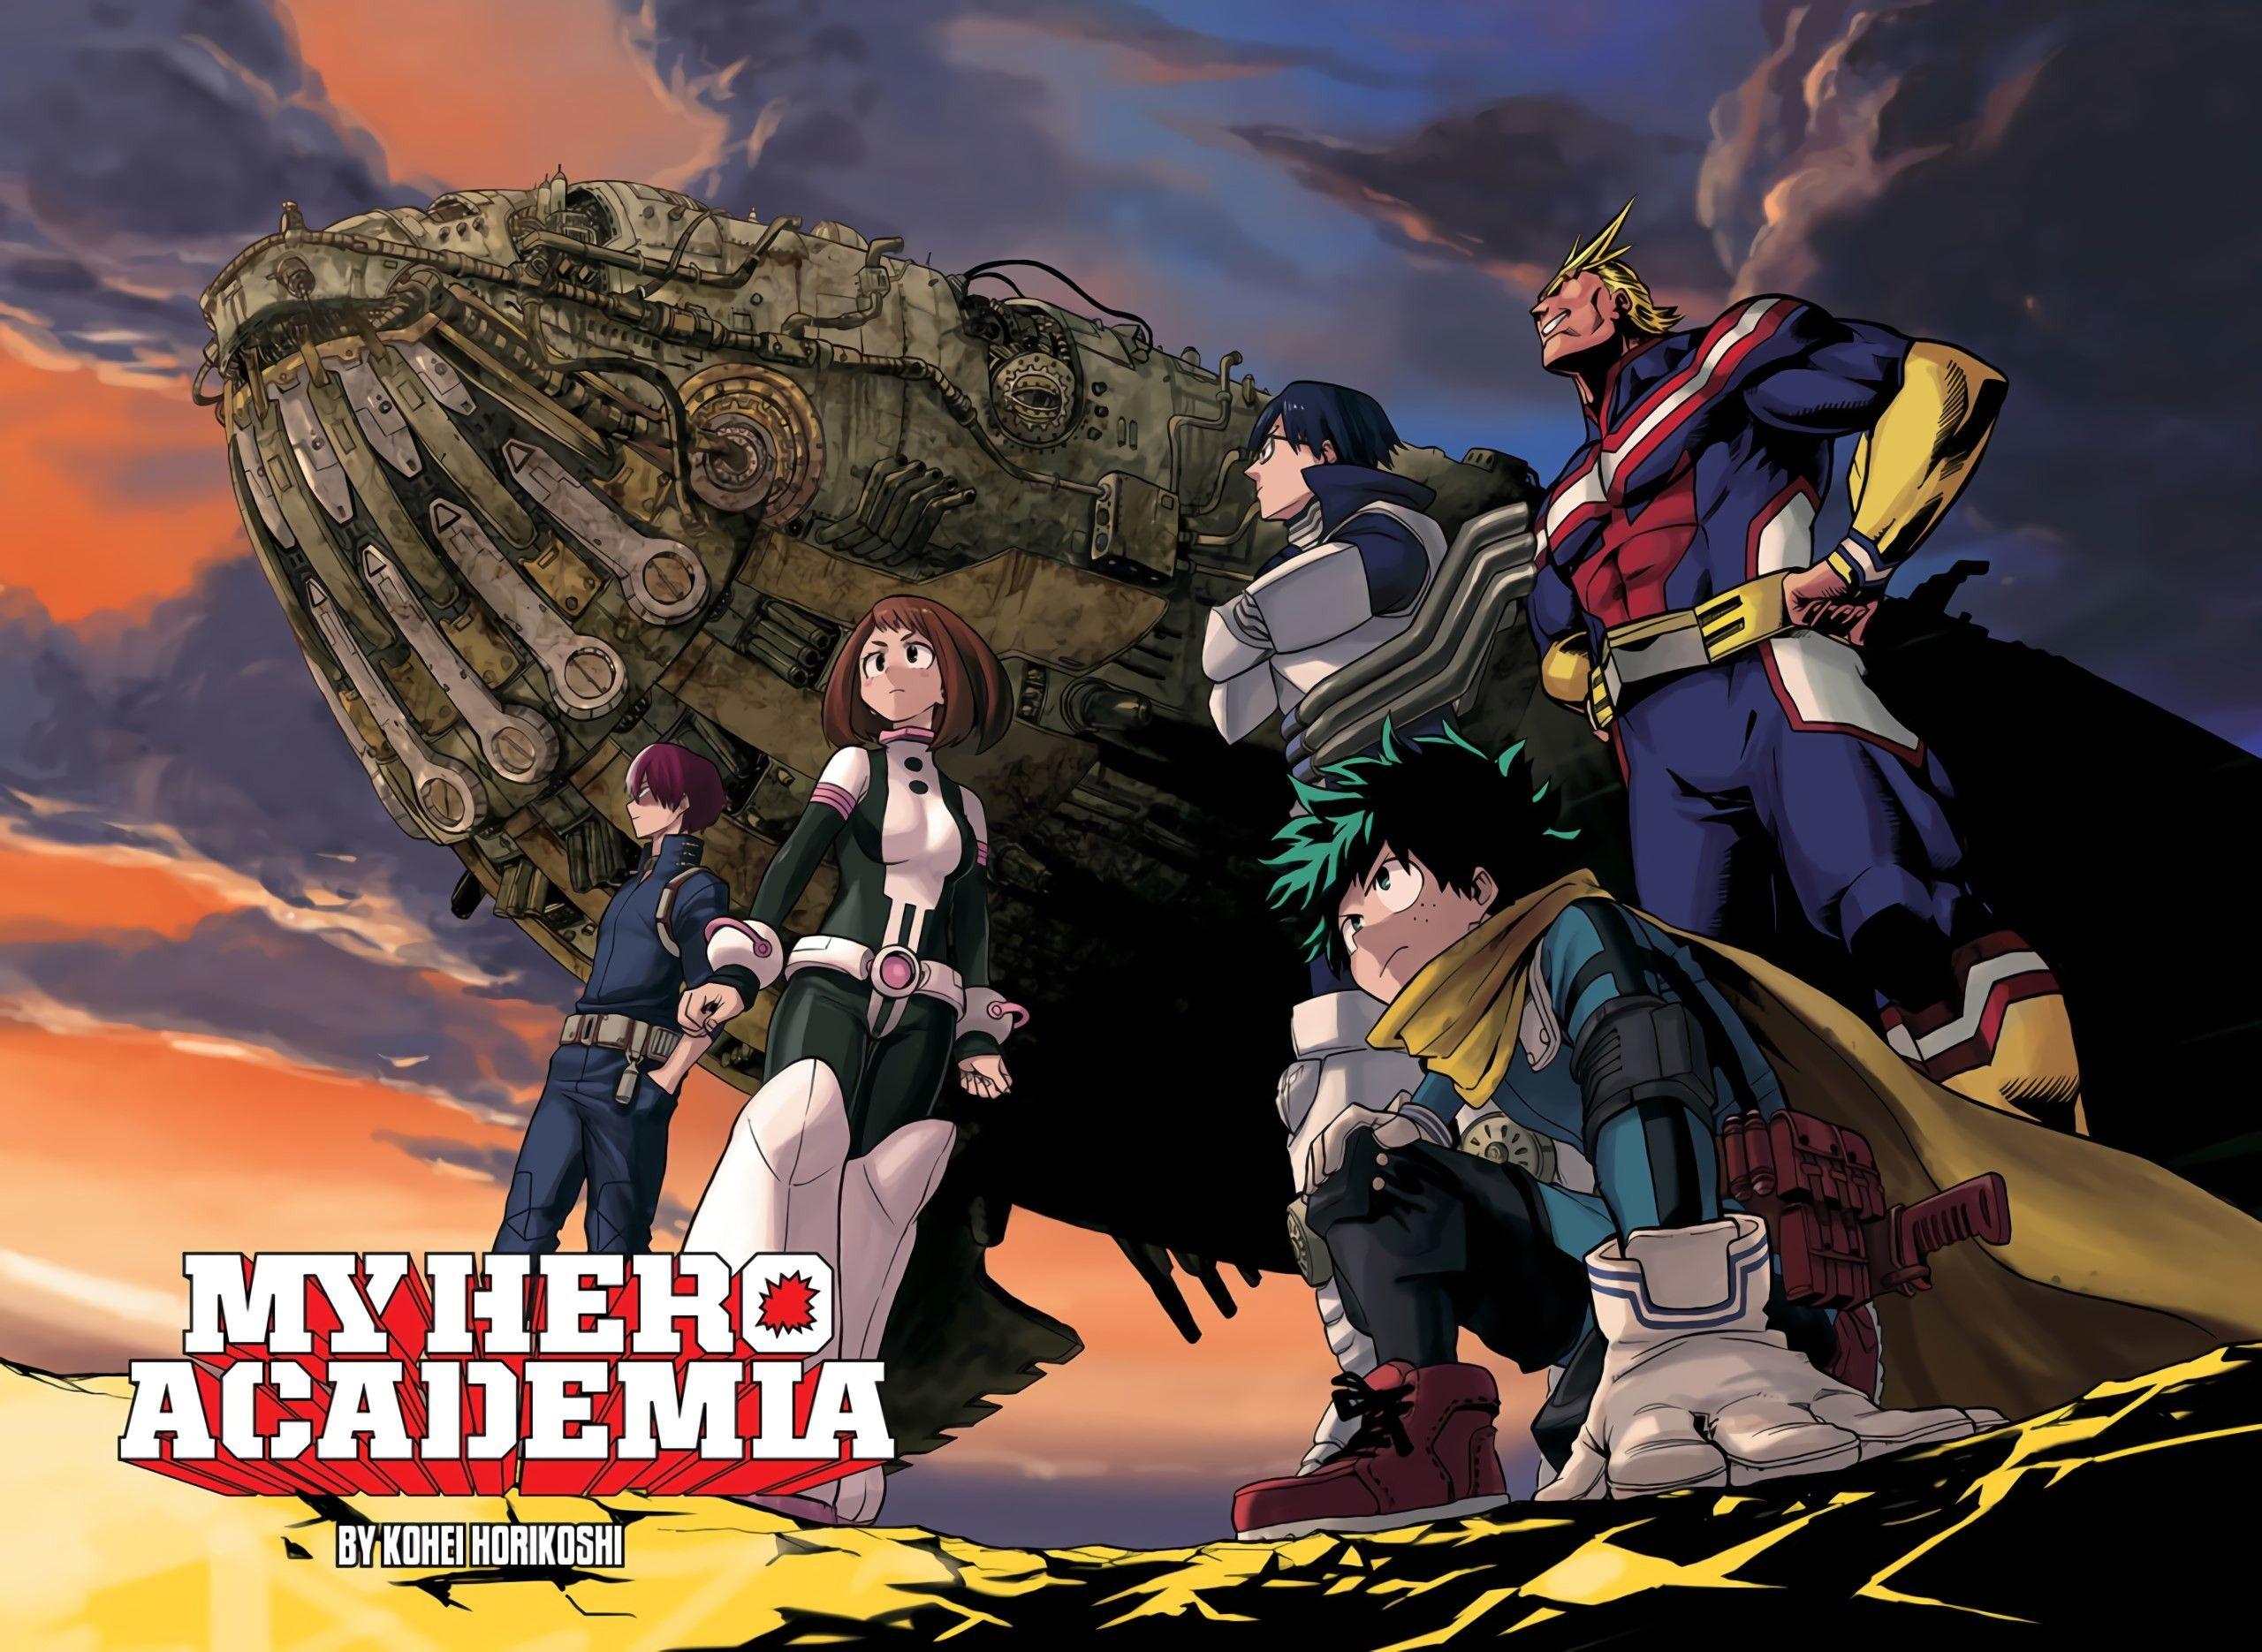 2560x1870 Boku No Hero Academia Wallpaper High Definition Backgrounds Everly Fairy 2017 03 Hero Wallpaper Boku No Hero Academia My Hero